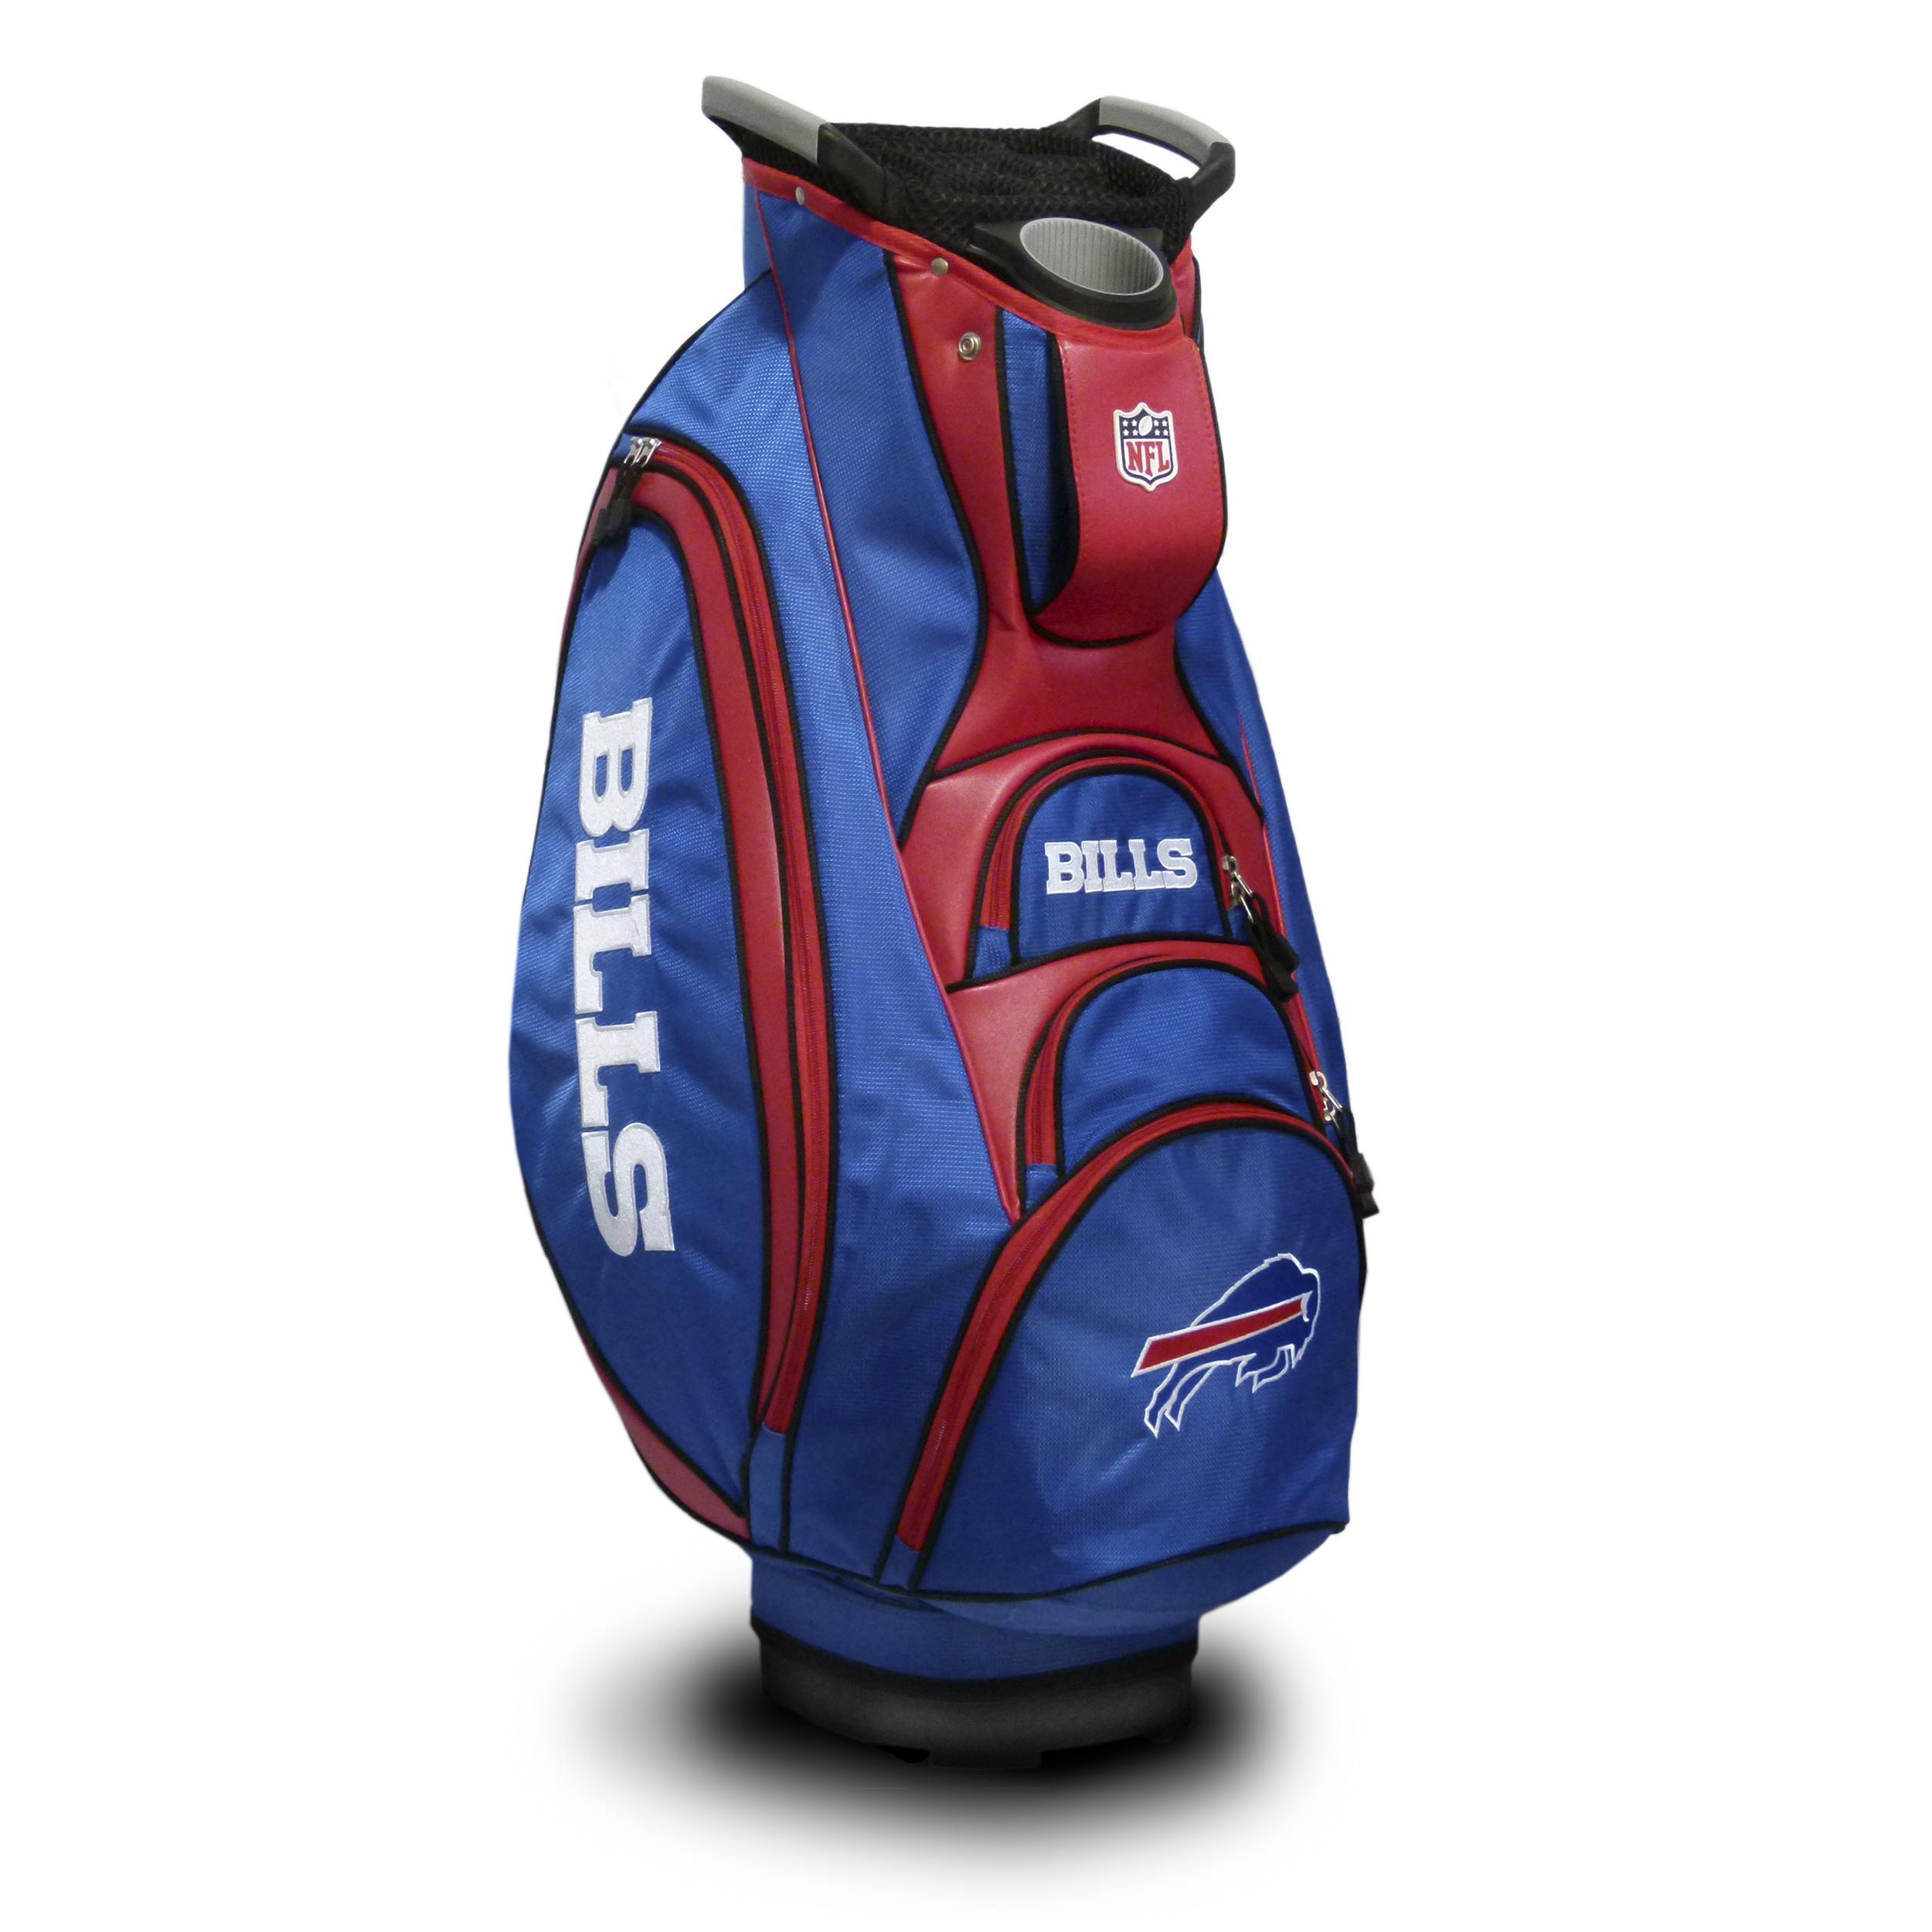 Nfl Victory Cart Golf Bag Golf Bag By Team Golf